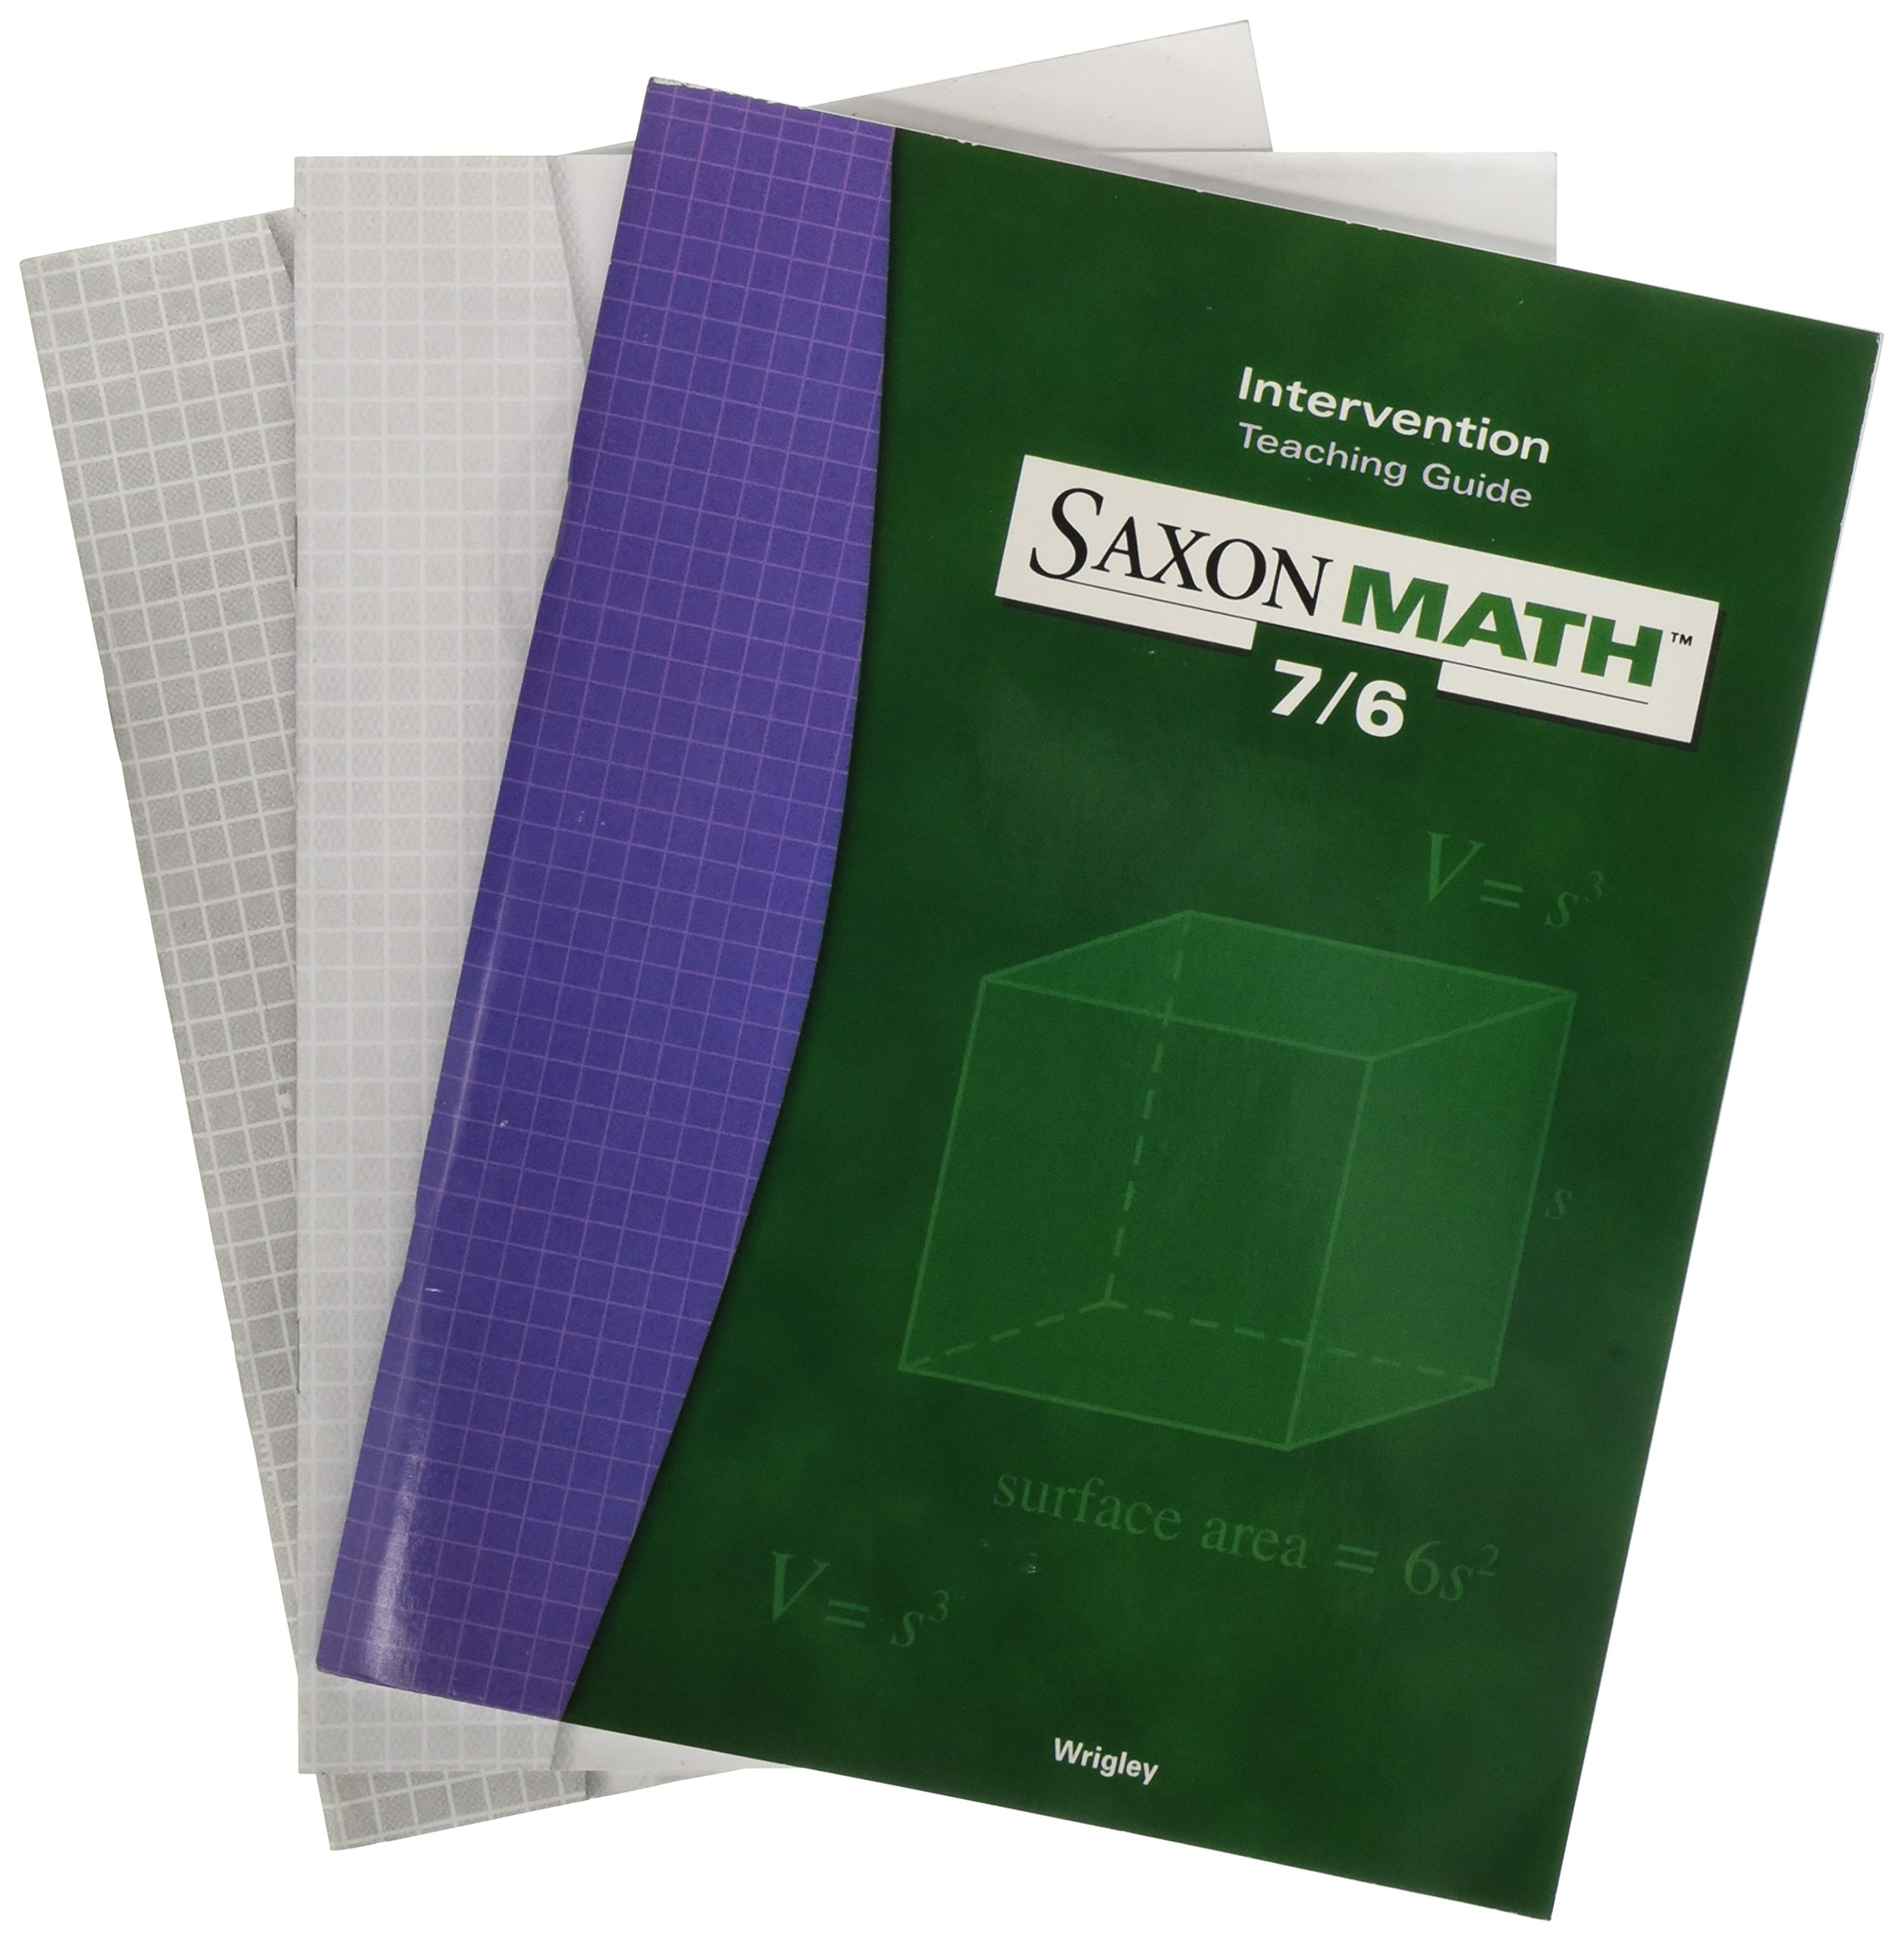 Saxon Math 7/6: Teaching Guide   (Level 7/6) Intervention 2000 pdf epub